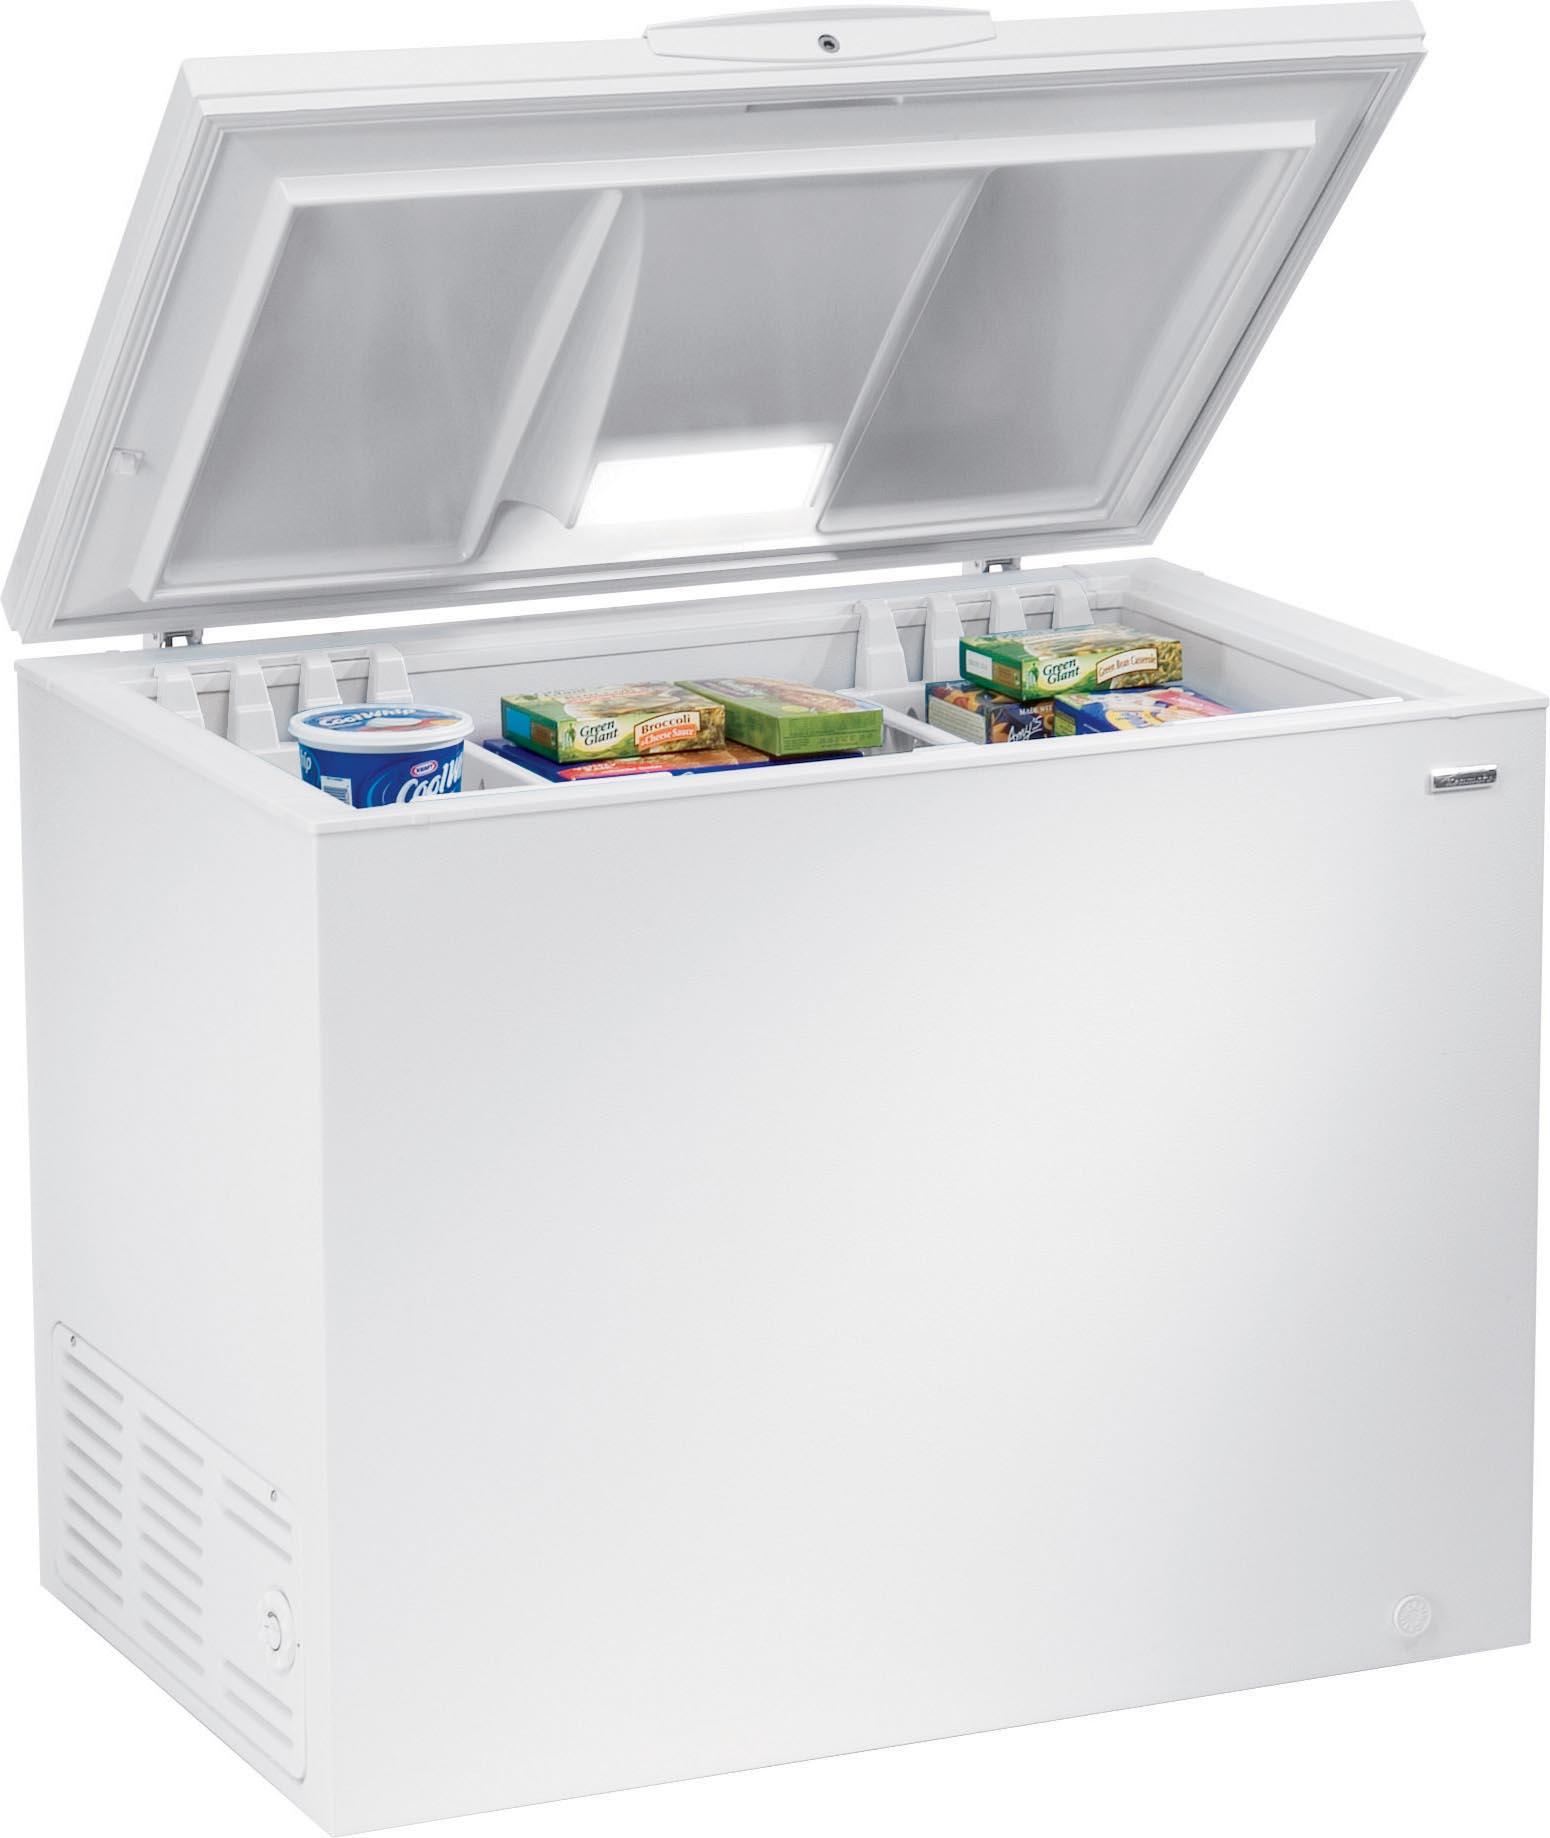 medium resolution of kenmore model 25316342101 chest freezer genuine parts kenmore freezer relays diagram kenmore chest freezer wiring diagram